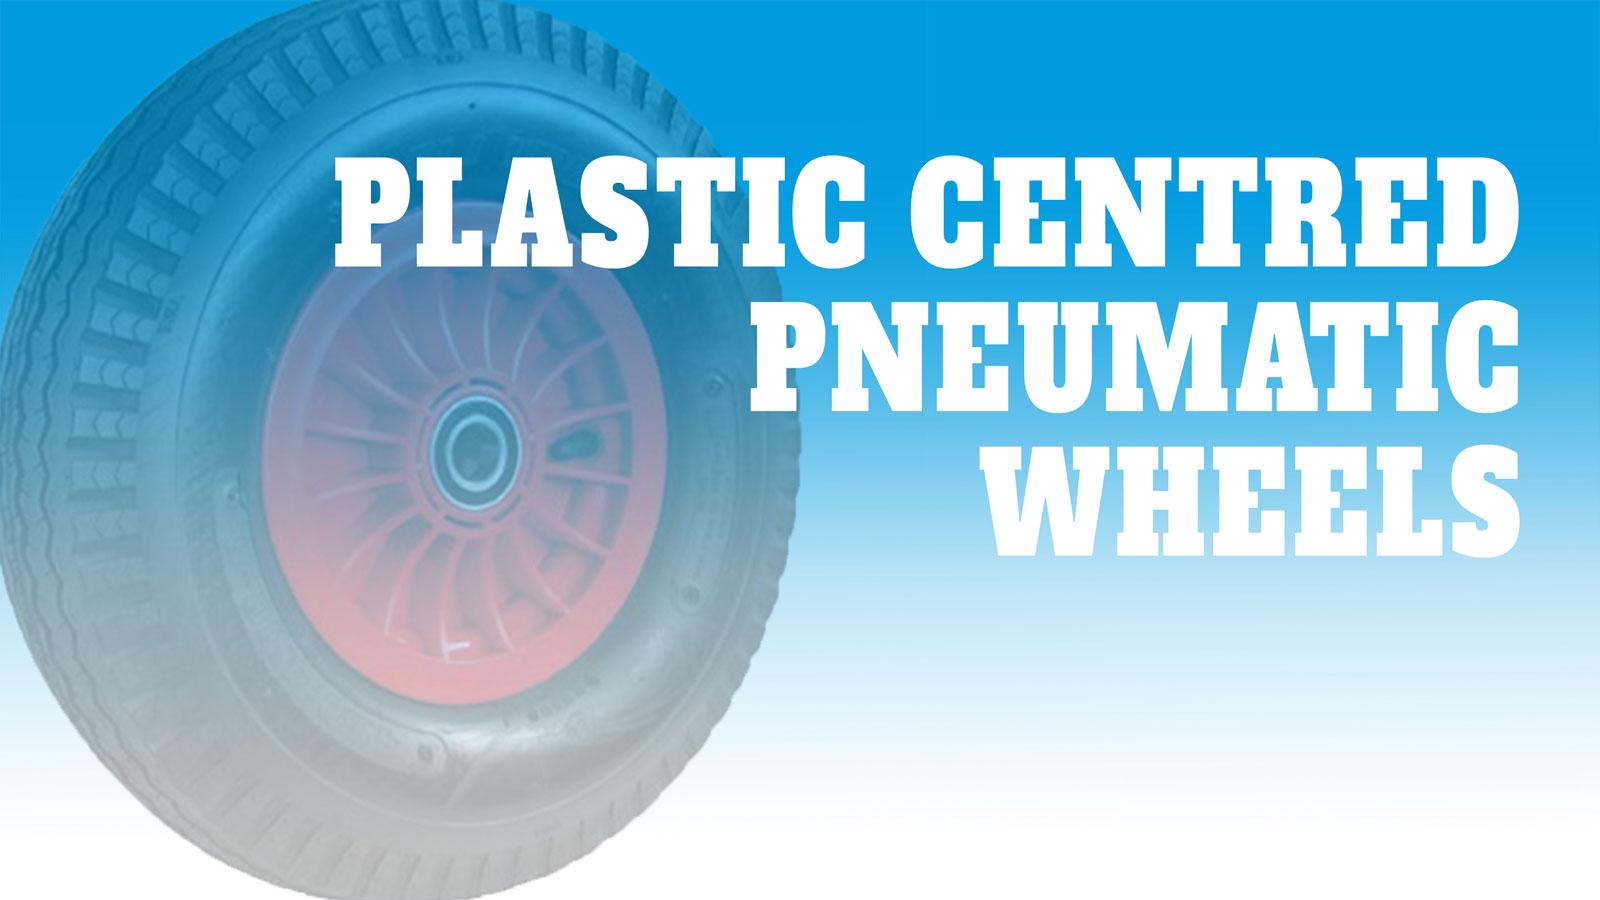 Wheels-Plastic-Centred-Pneumatic